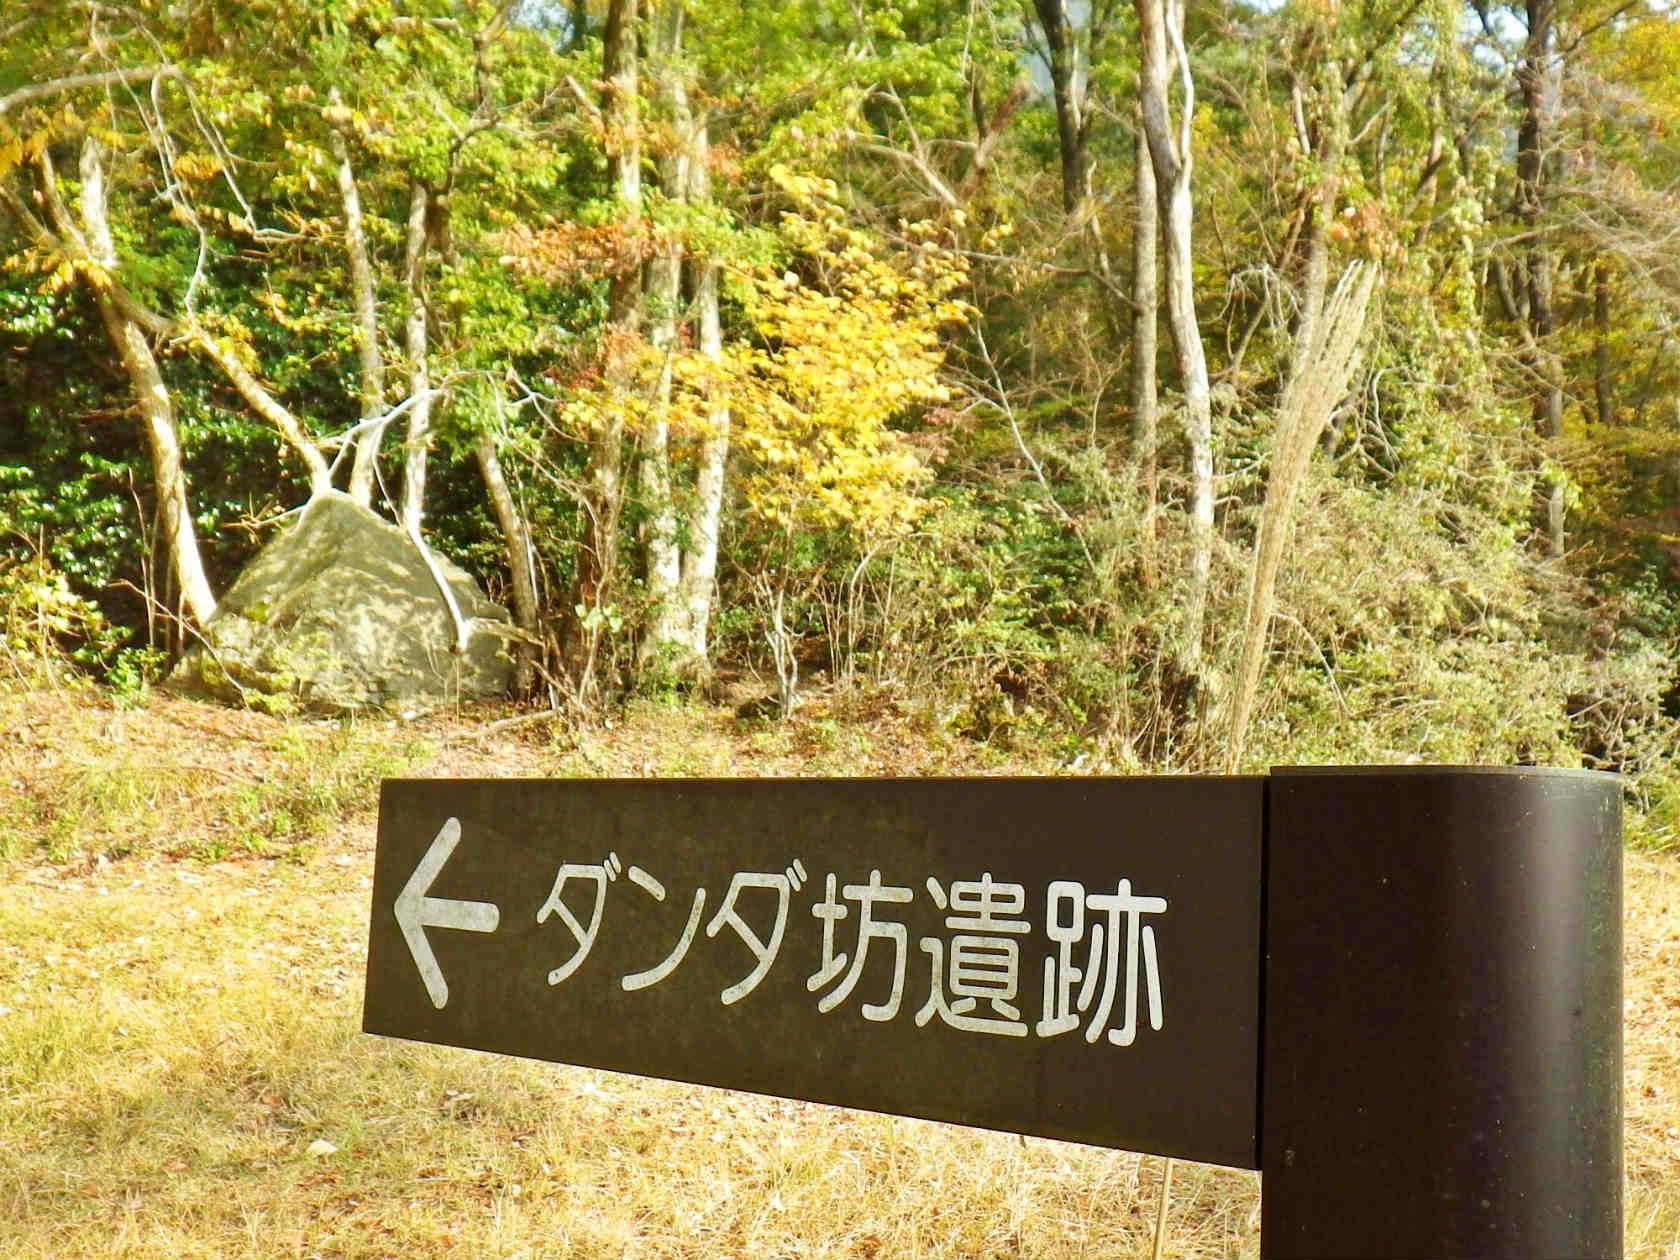 03a ダンダ坊遺跡の標識